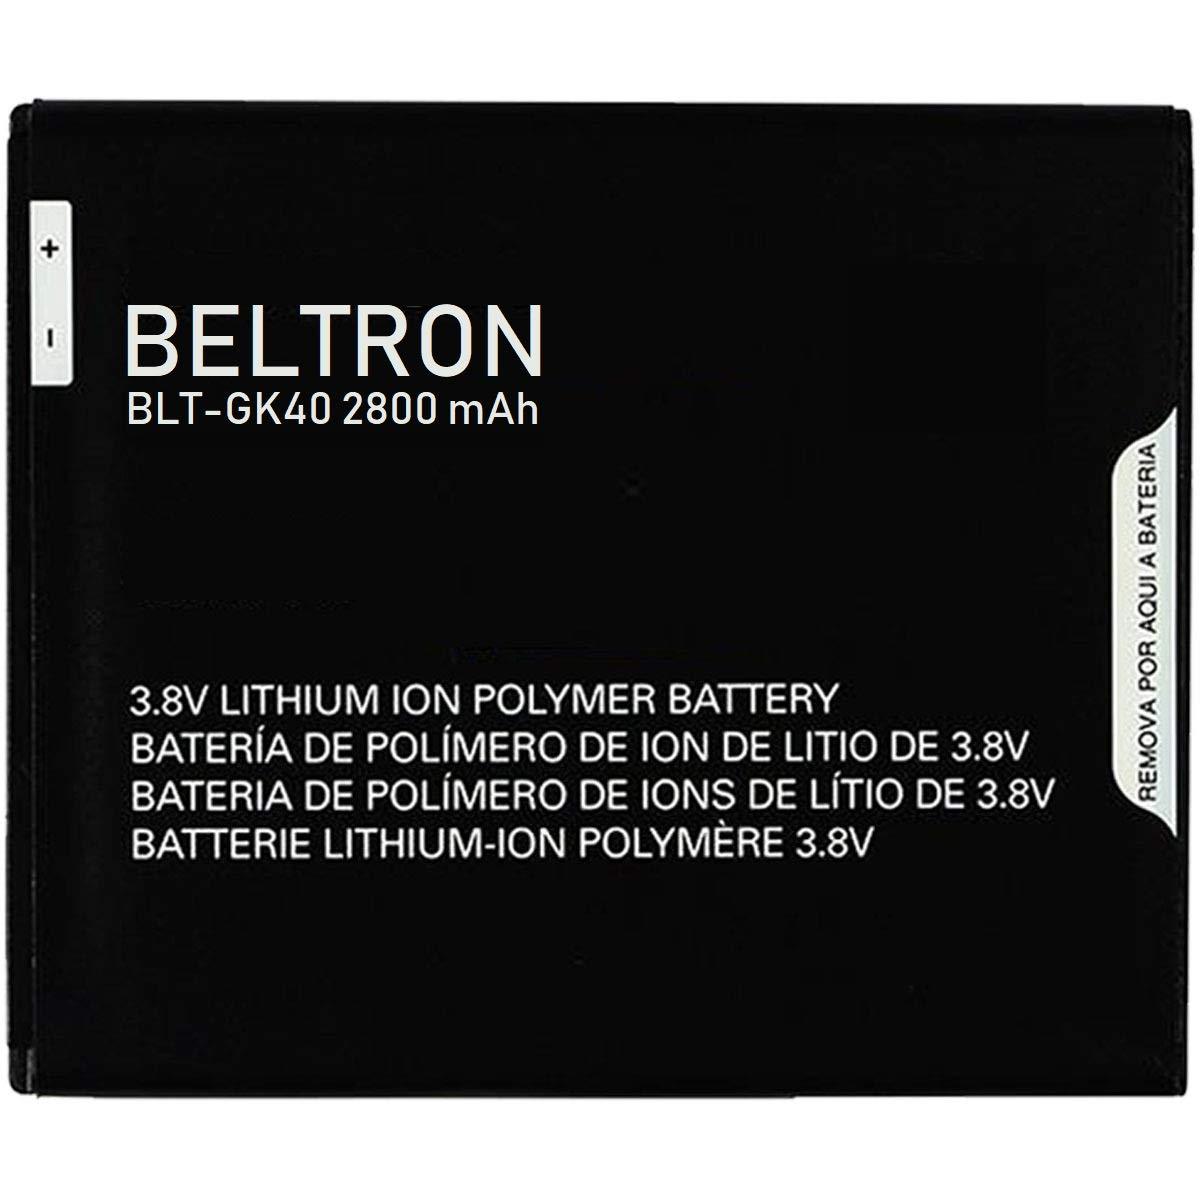 Bateria Celular 2800 mAh BELTRON para Motorola G4 Play XT1607 GK40